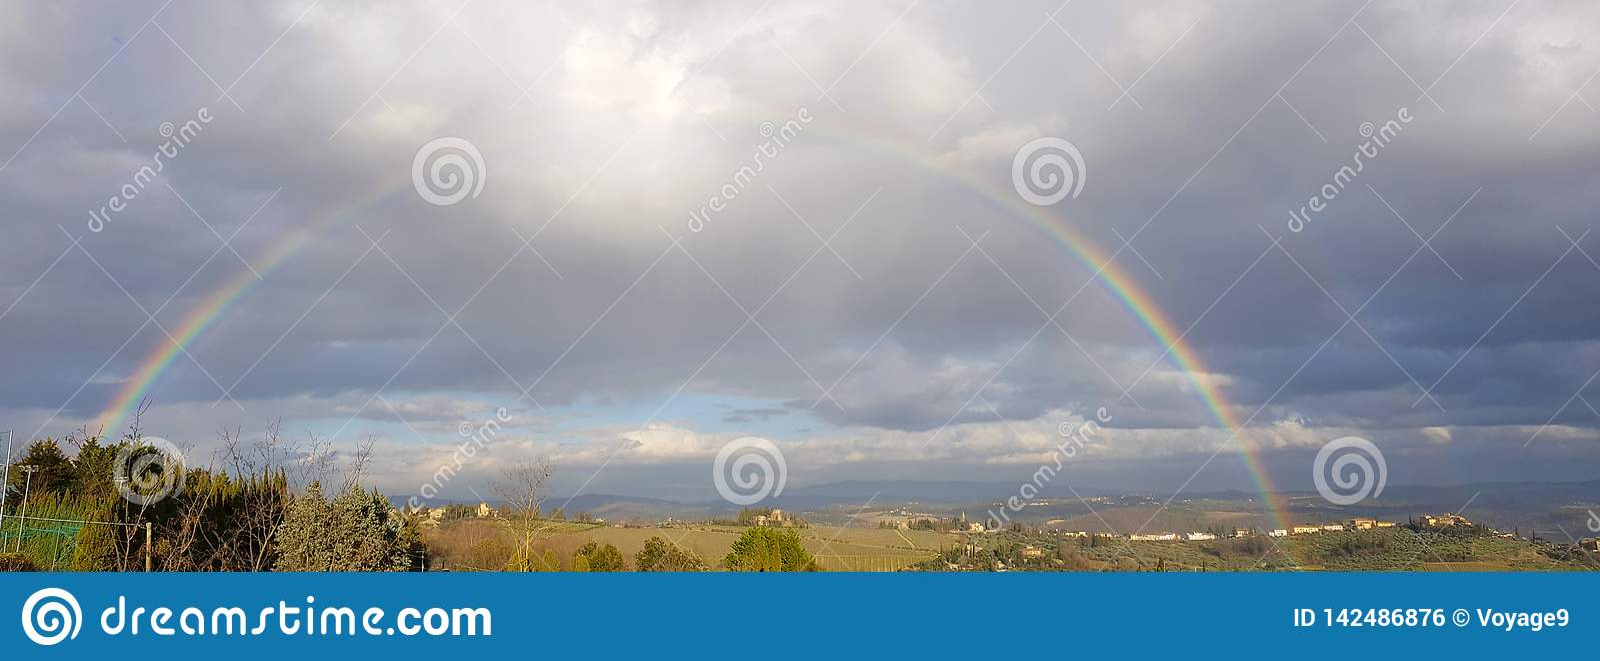 Впечатляющая полная радуга над холмами Chianti, Тоскана, Италия